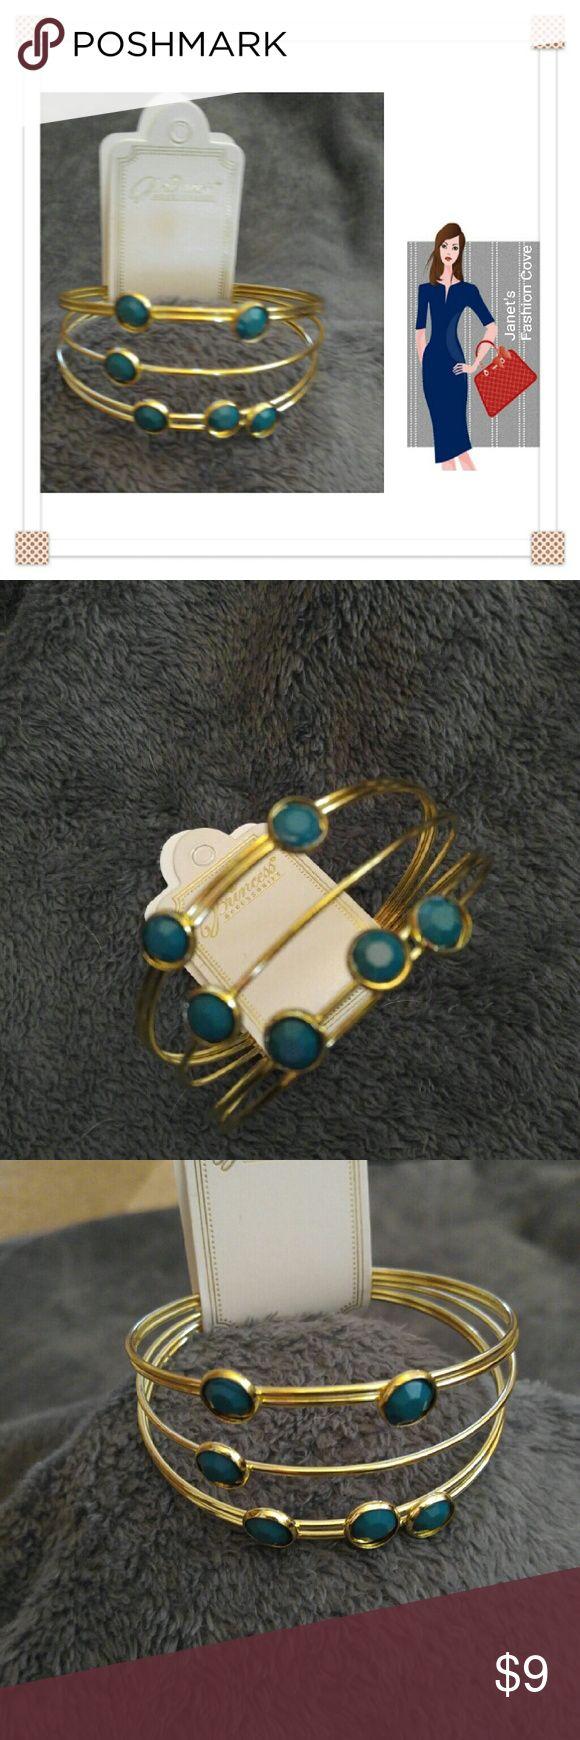 Layered Look Trendy Green & Gold Bracelet Very trendy layered look green gems and gold bracelet. Jewelry Bracelets